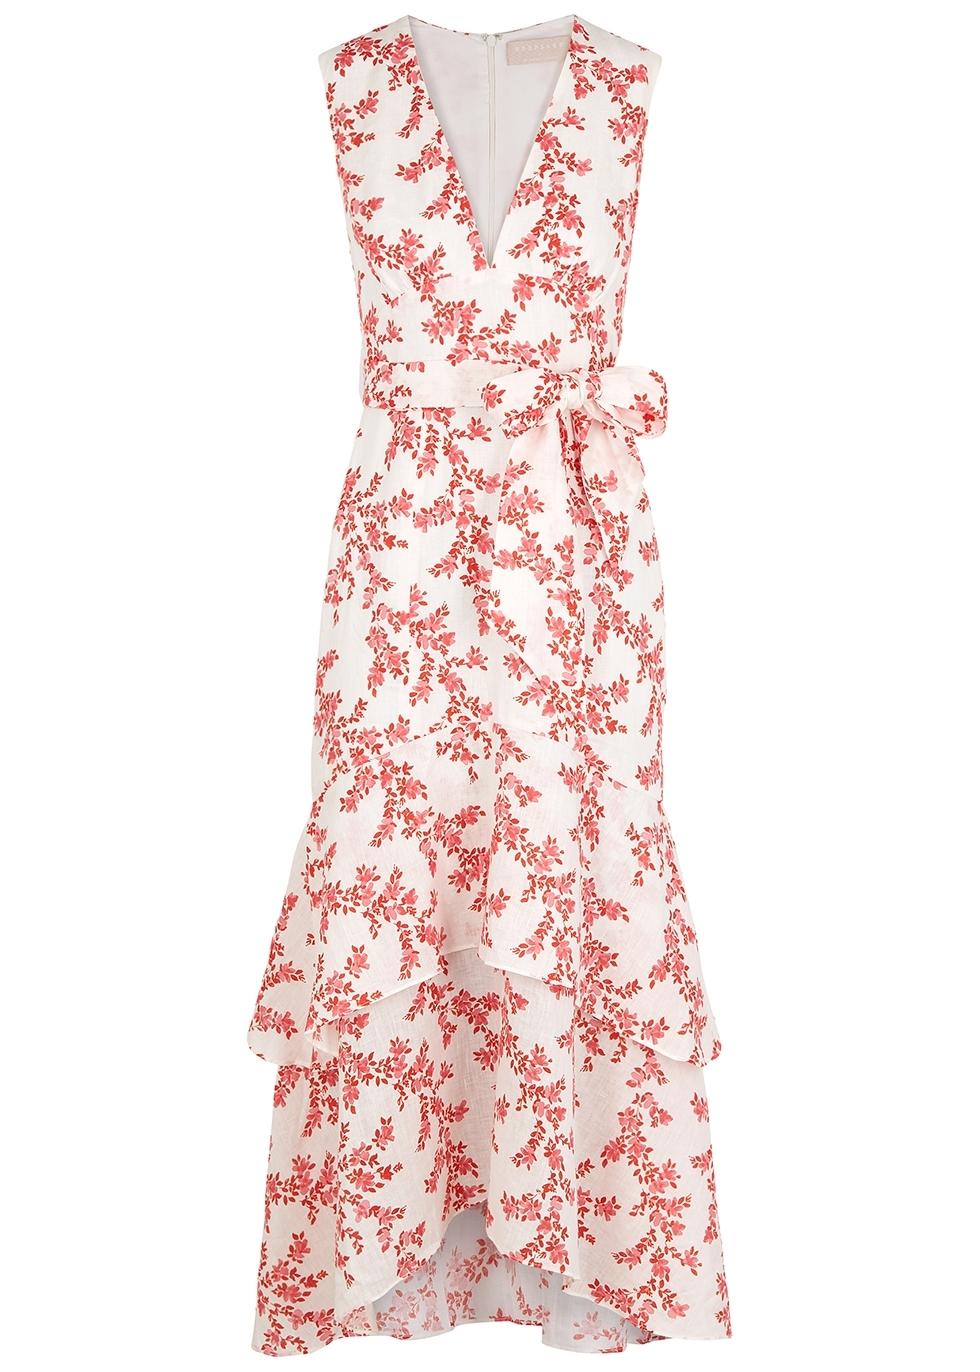 7117357f535 Women s Designer Clothing